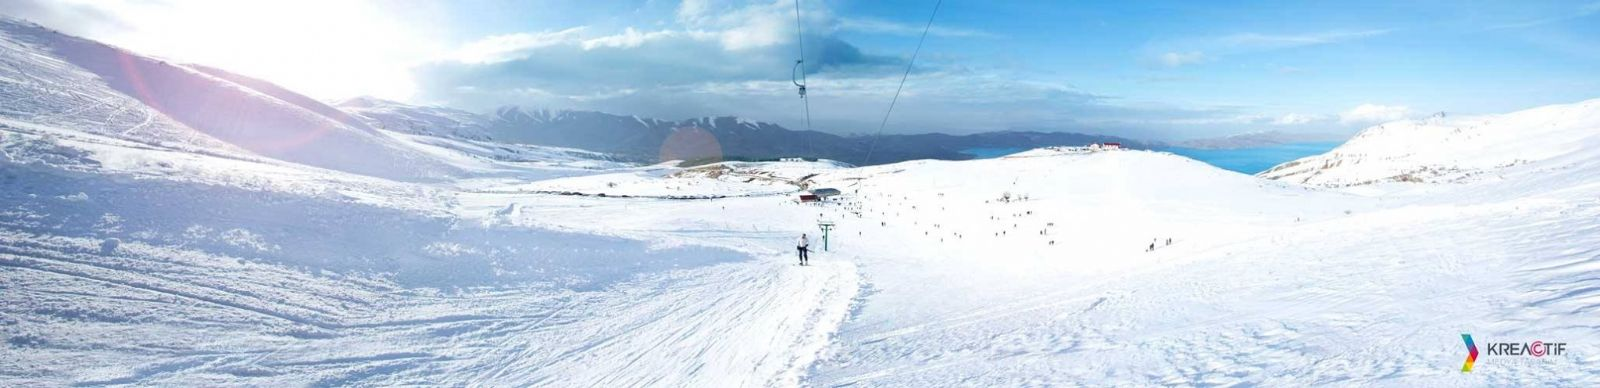 hazarbaba kayak merkezi panoramik fotograf cekimi kreactif